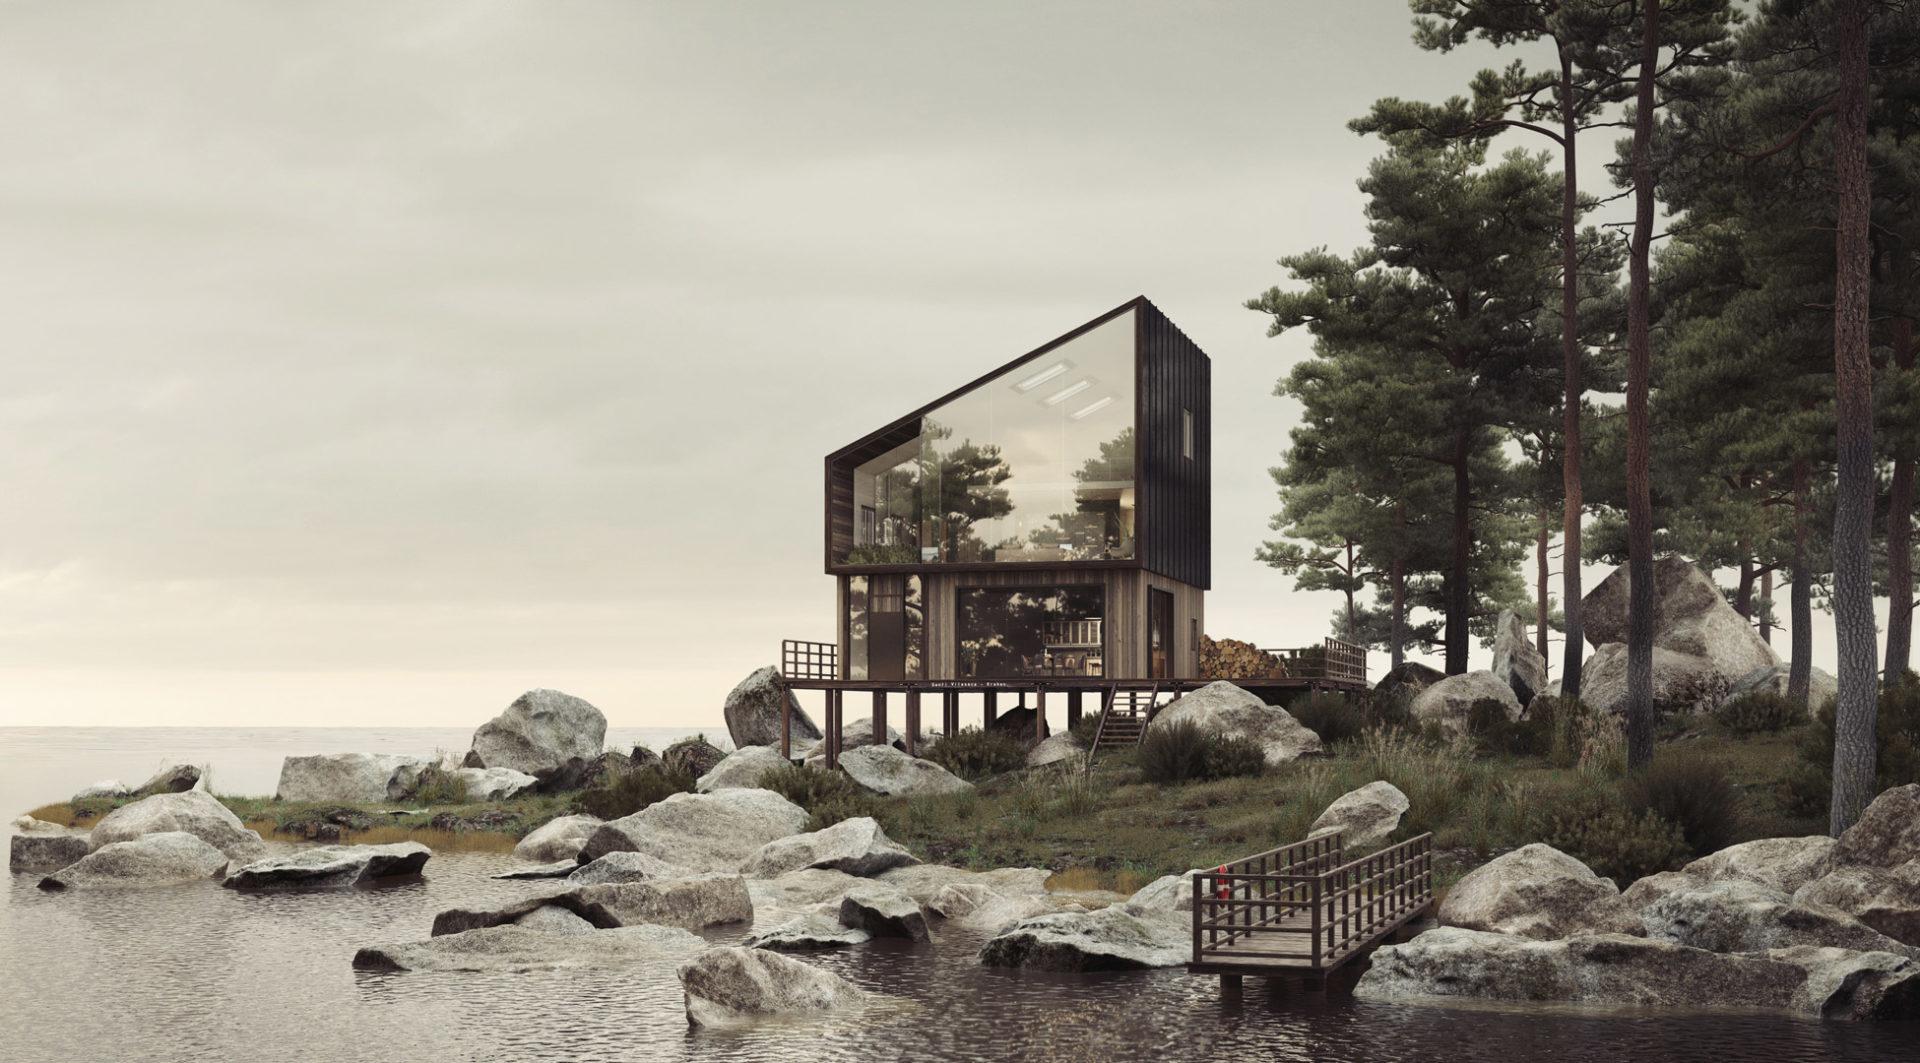 Casa Tri by Santiago Vilaseca, Kraken Studio